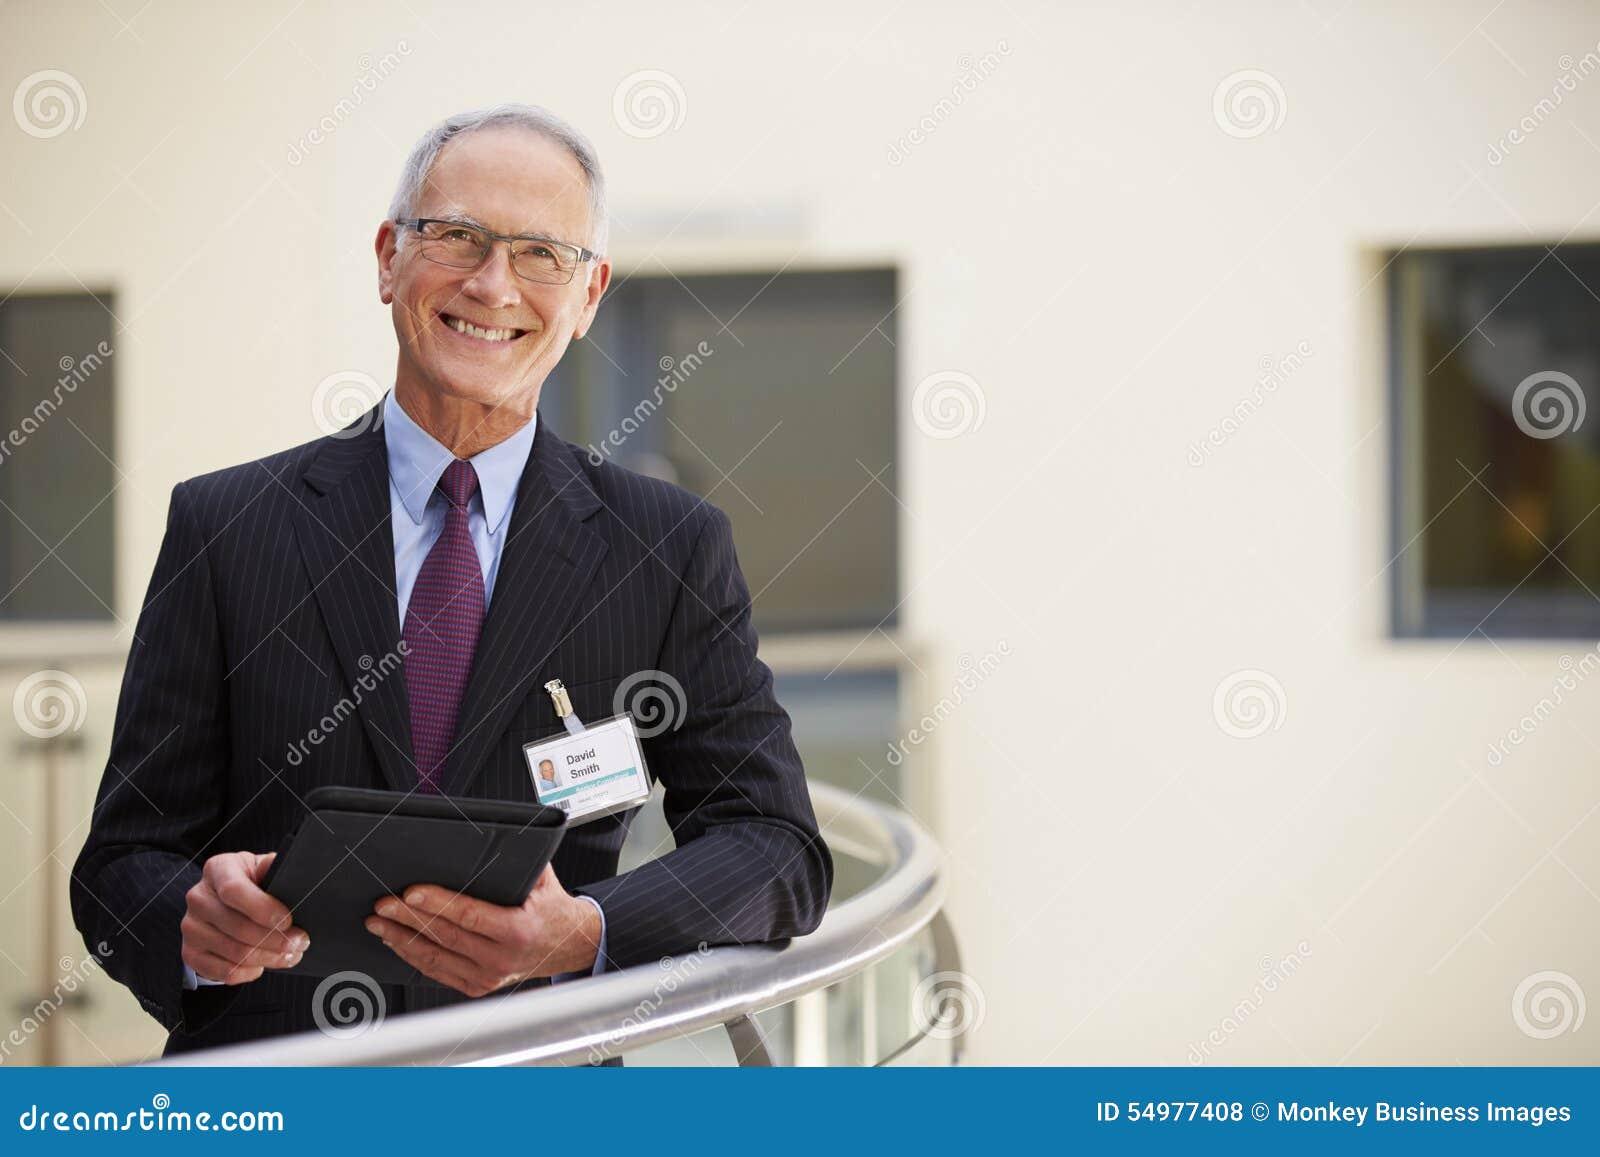 Stående av den manliga konsulenten Using Digital Tablet i sjukhus